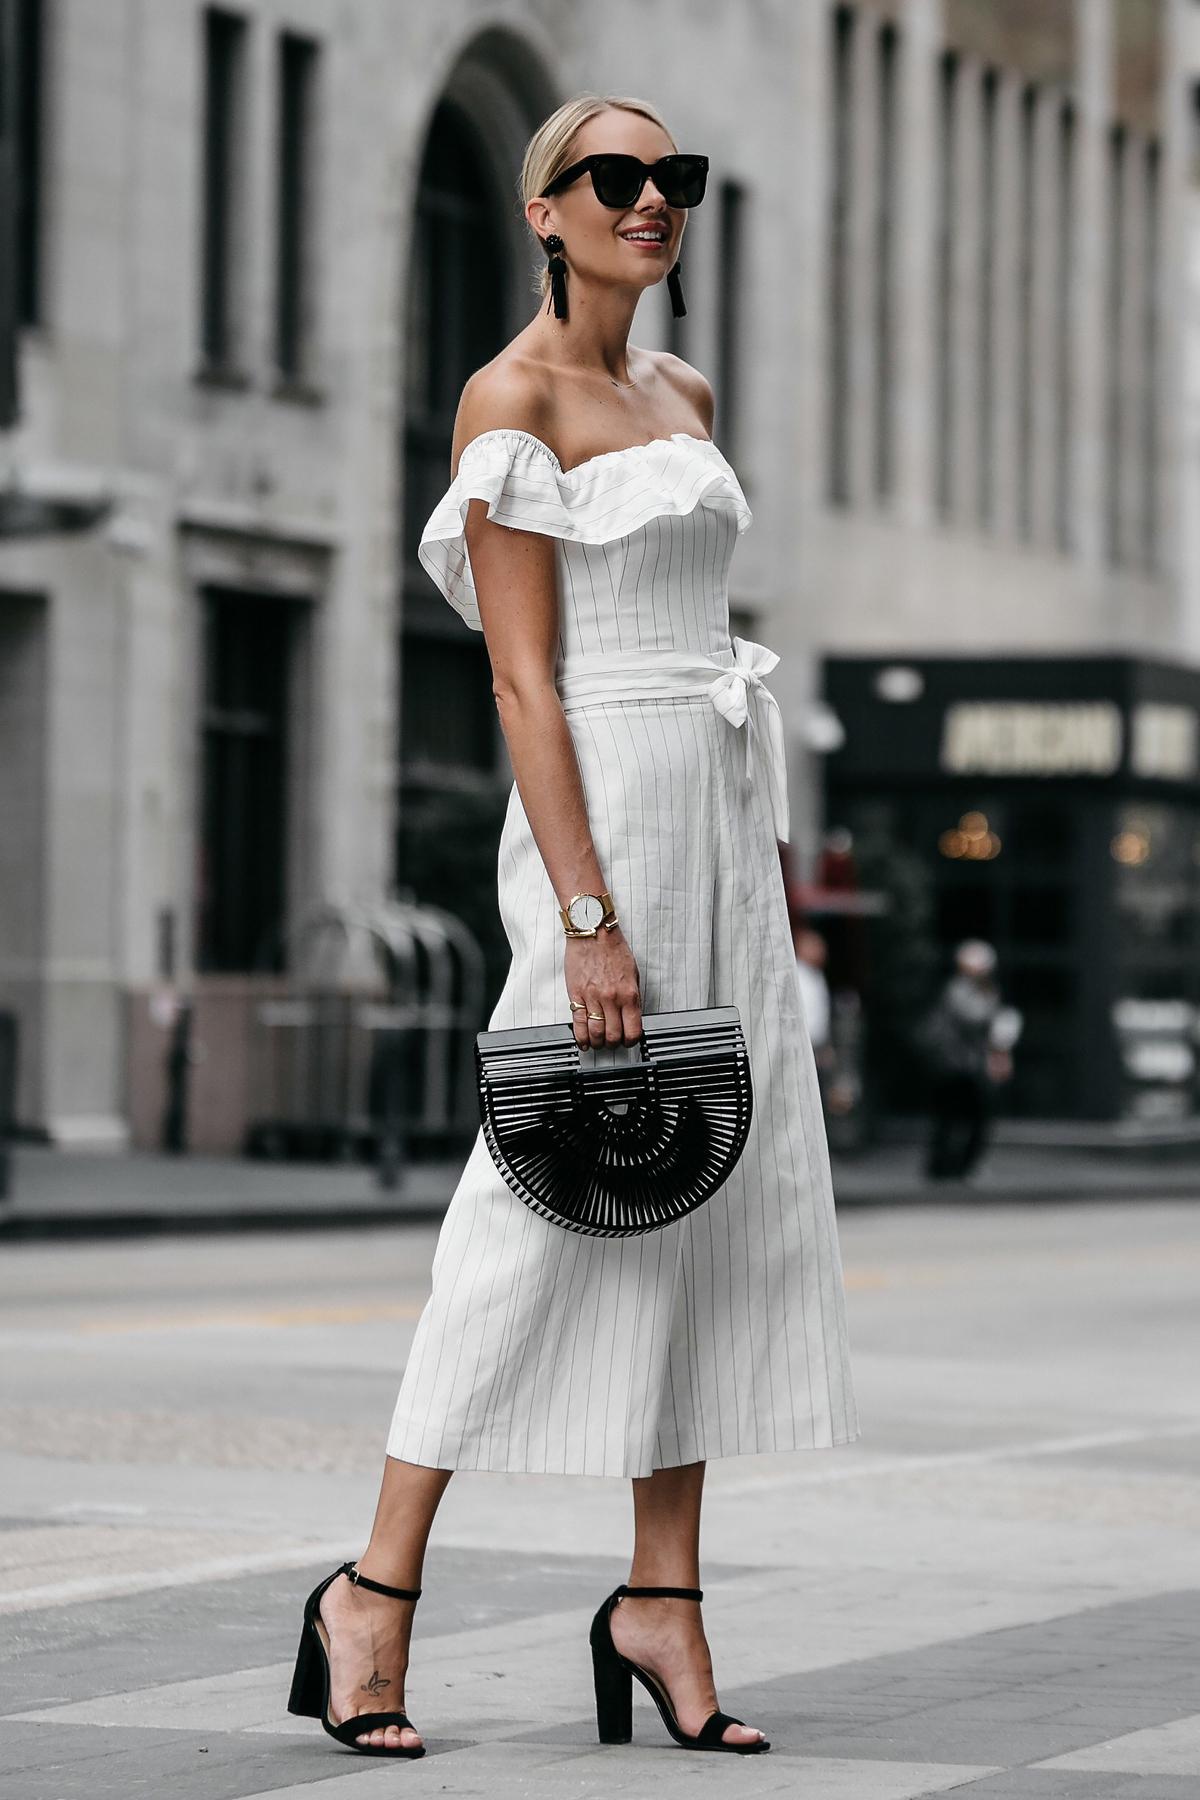 Blonde woman wearing Club Monaco off-the-shoulder ruffle white jumpsuit Cult Gaia Black Acrylic Ark Clutch Black Ankle Strap Heeled Sandals Black Tassel Earrings